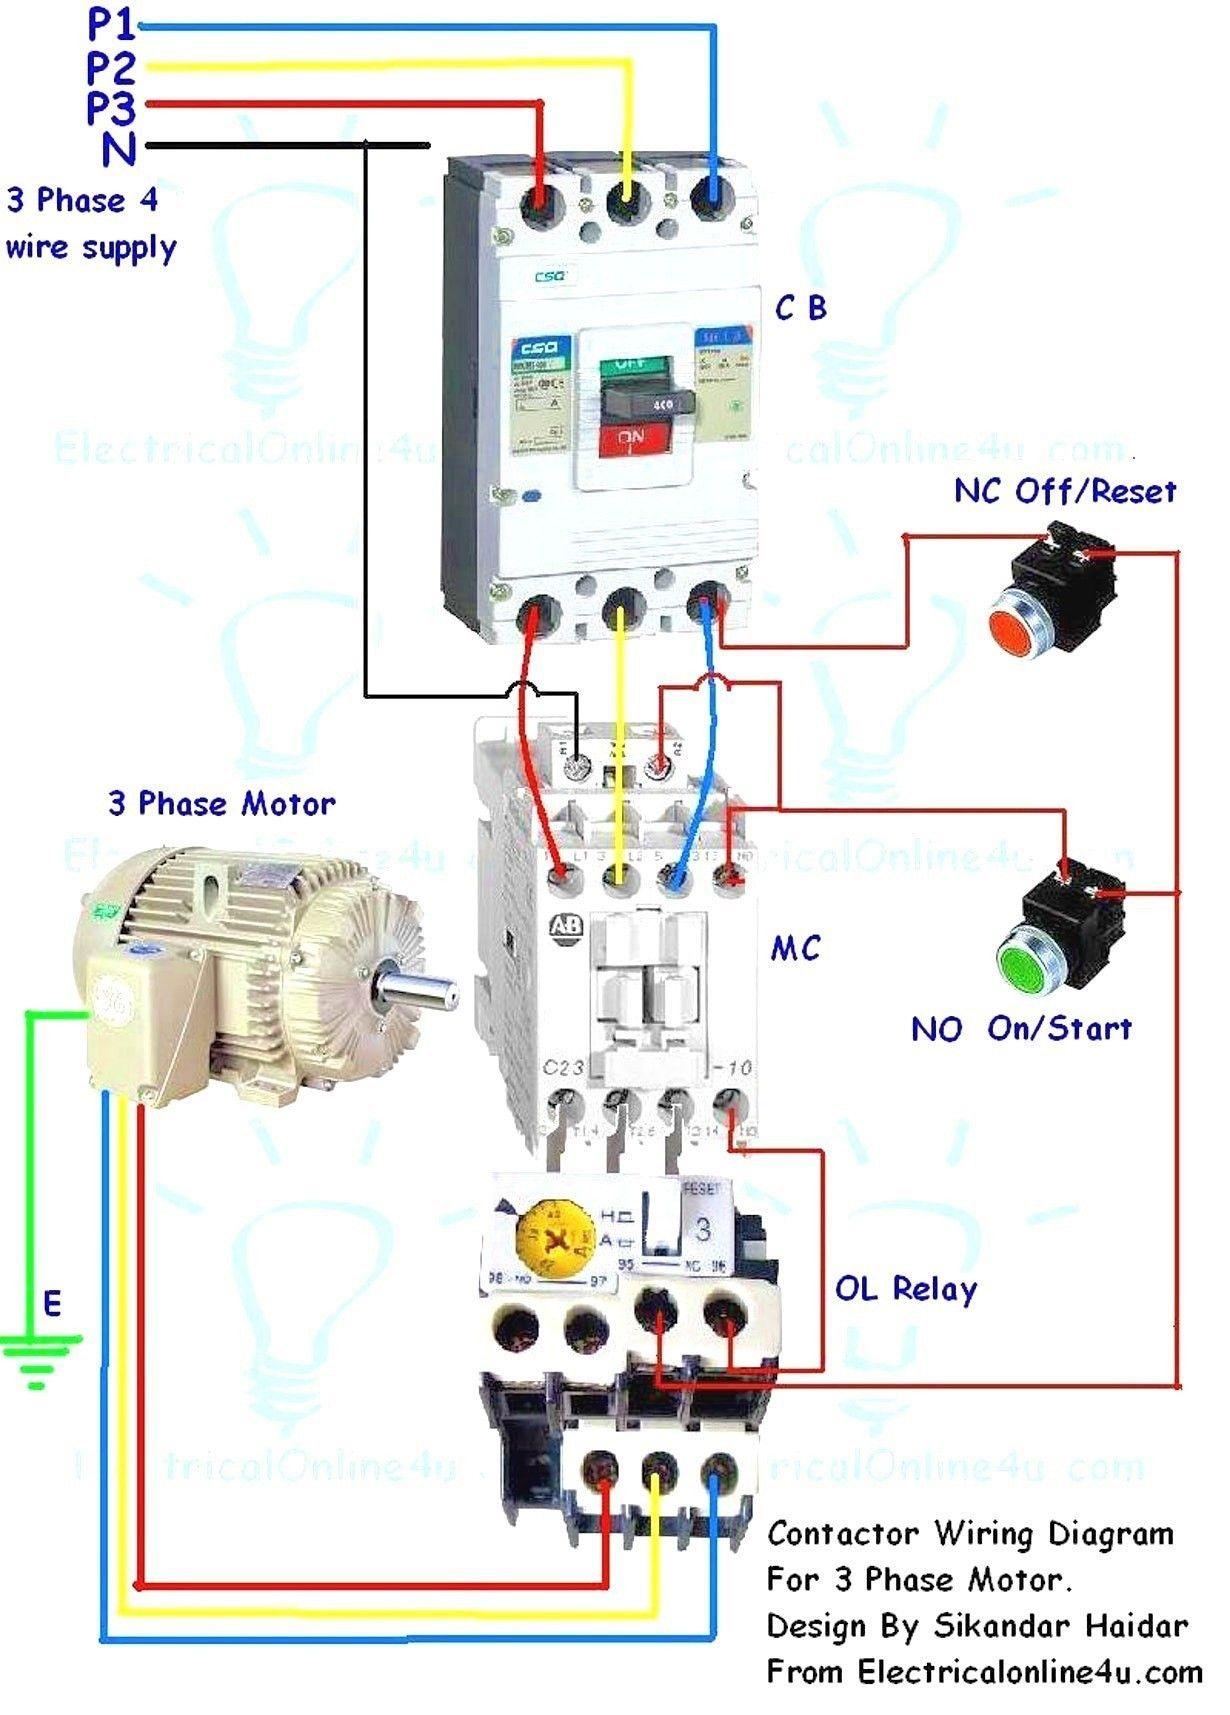 13an662g729 mtd wiring diagram [ 1230 x 1715 Pixel ]